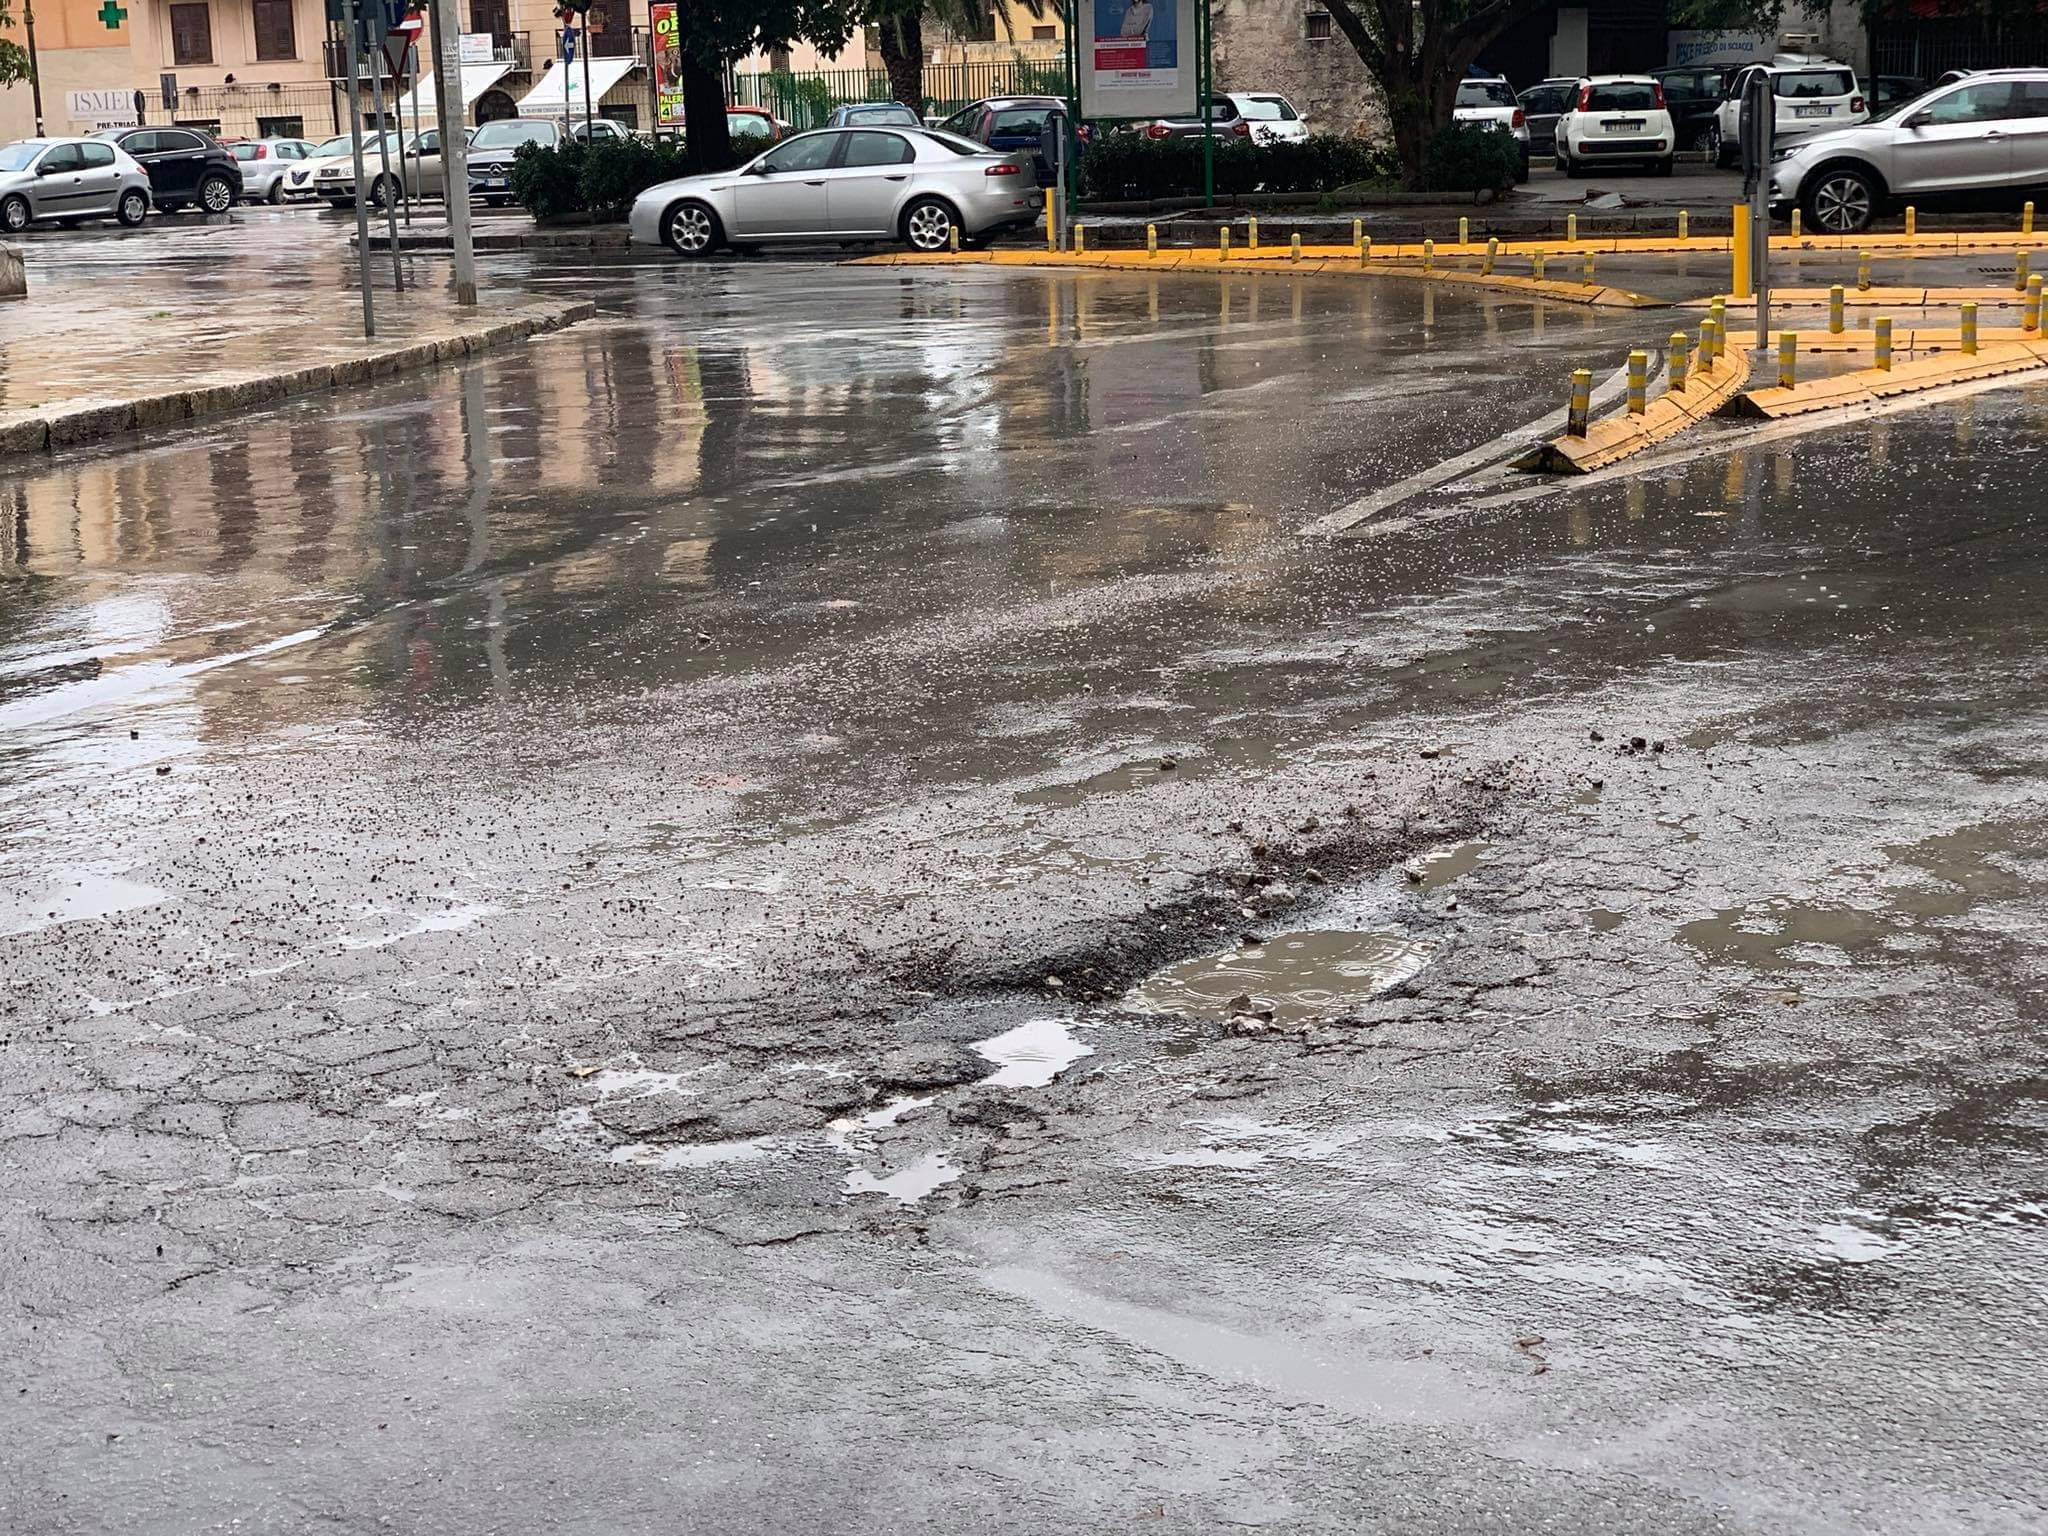 Strade abbandonate, Corso Tukory cade a pezzi! /PALERMO-CITTA' 63